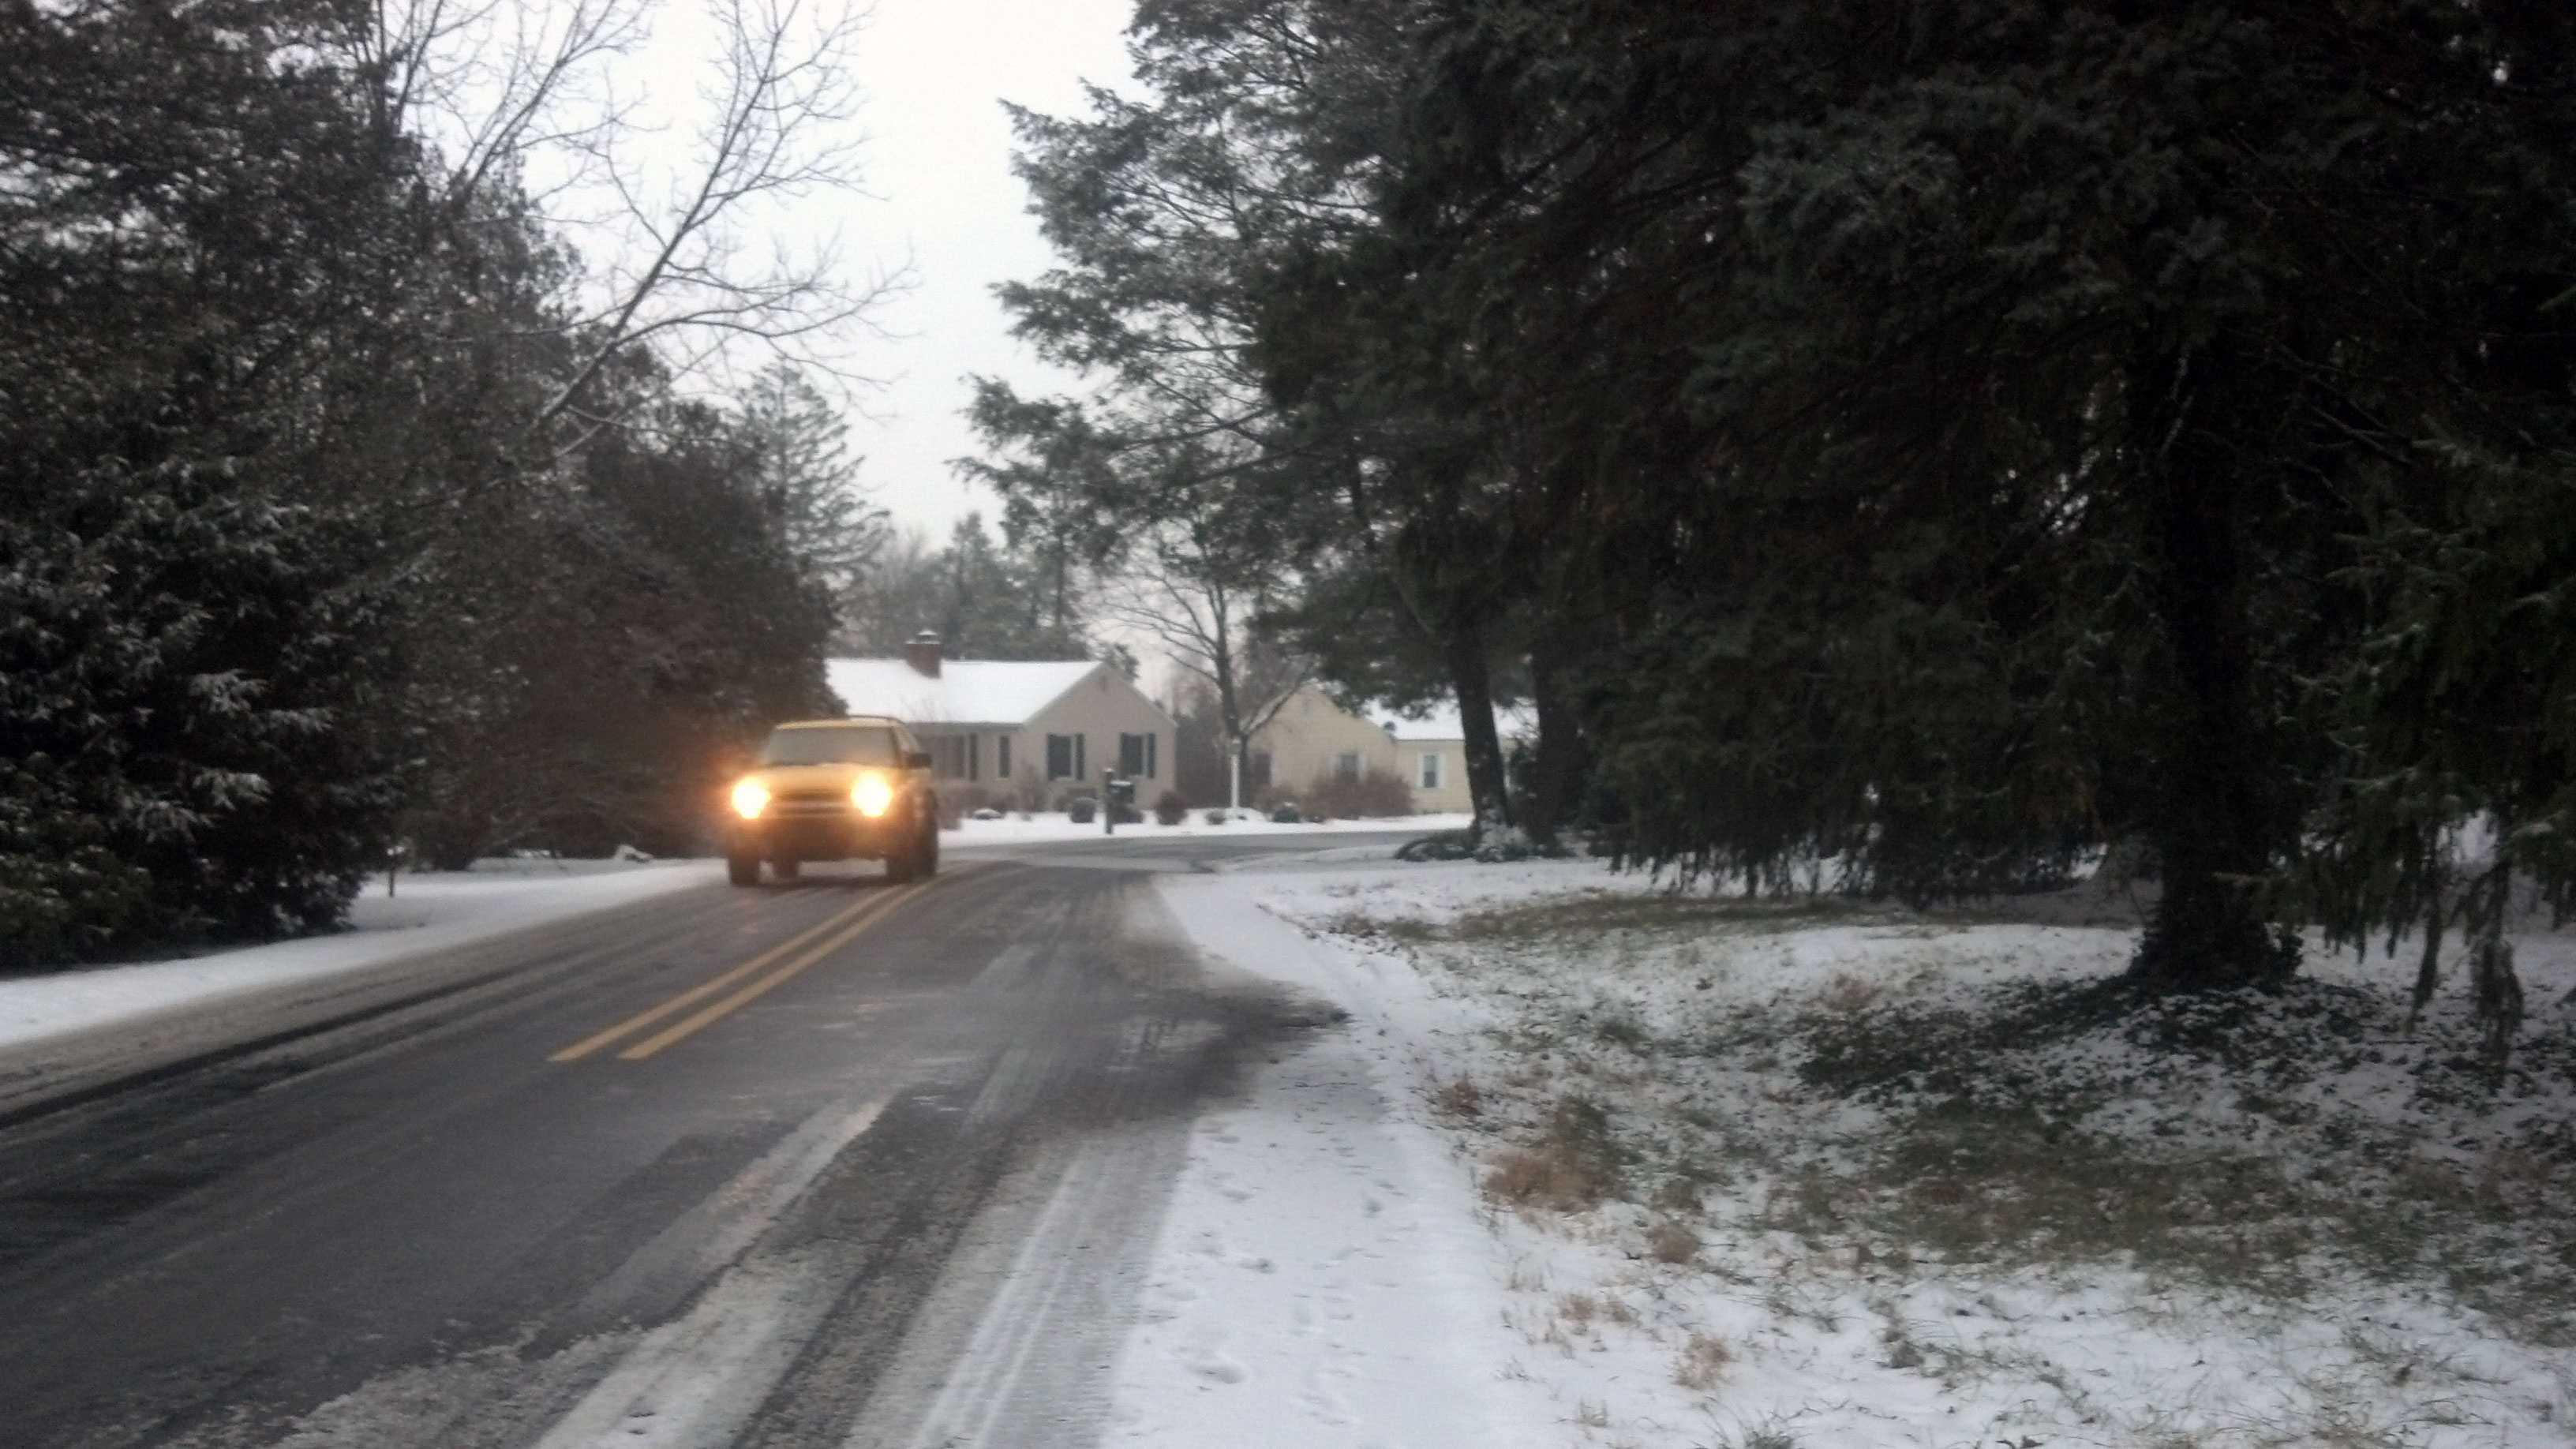 Manheim Township on Monday morning